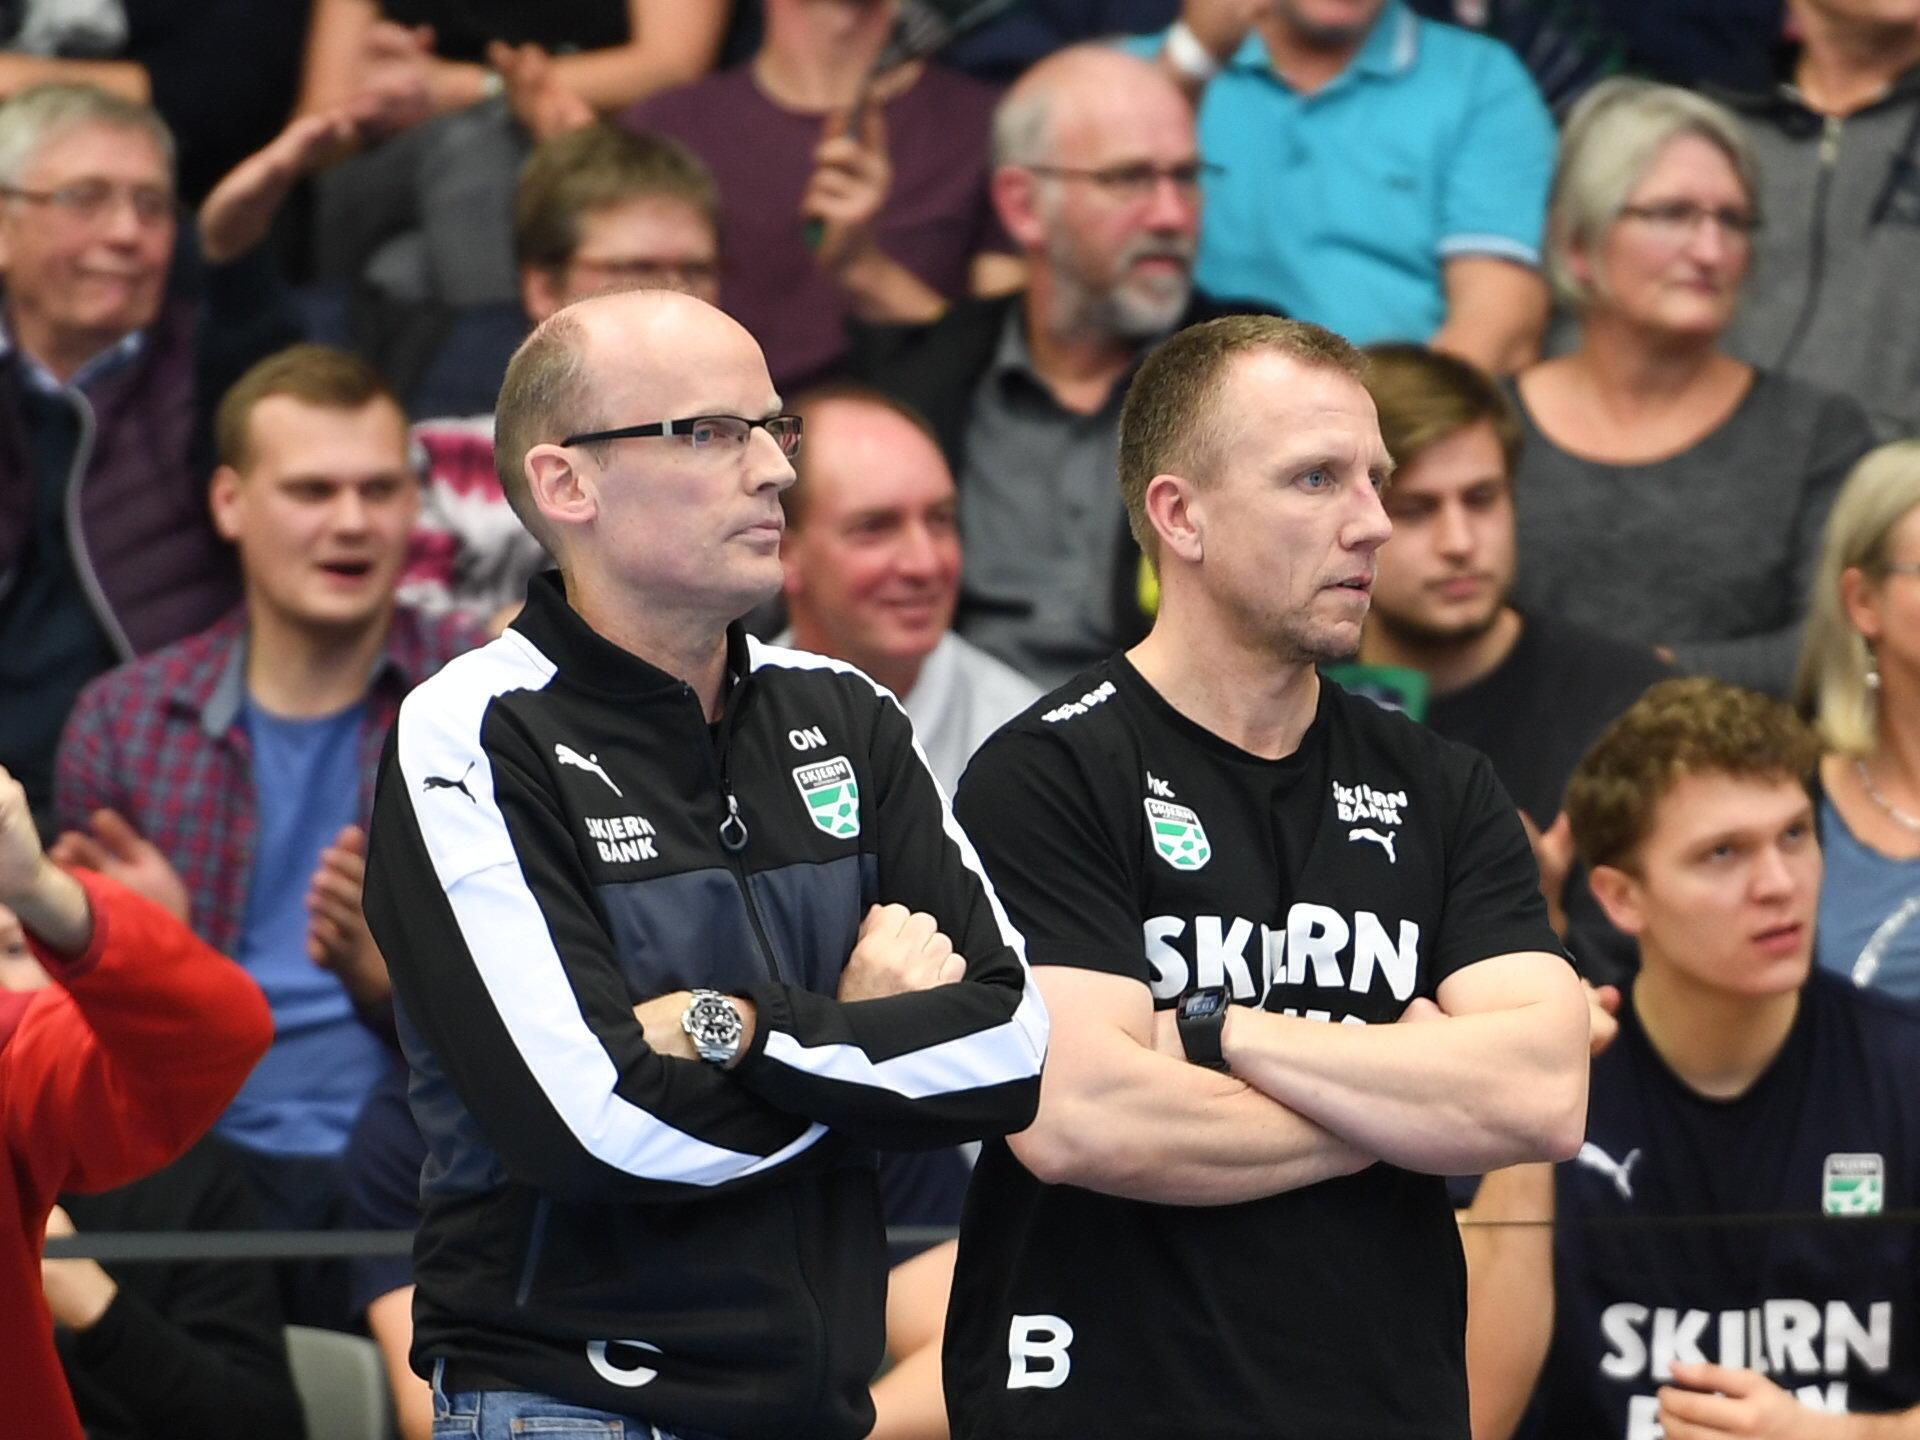 Foto: Skjern Håndbold